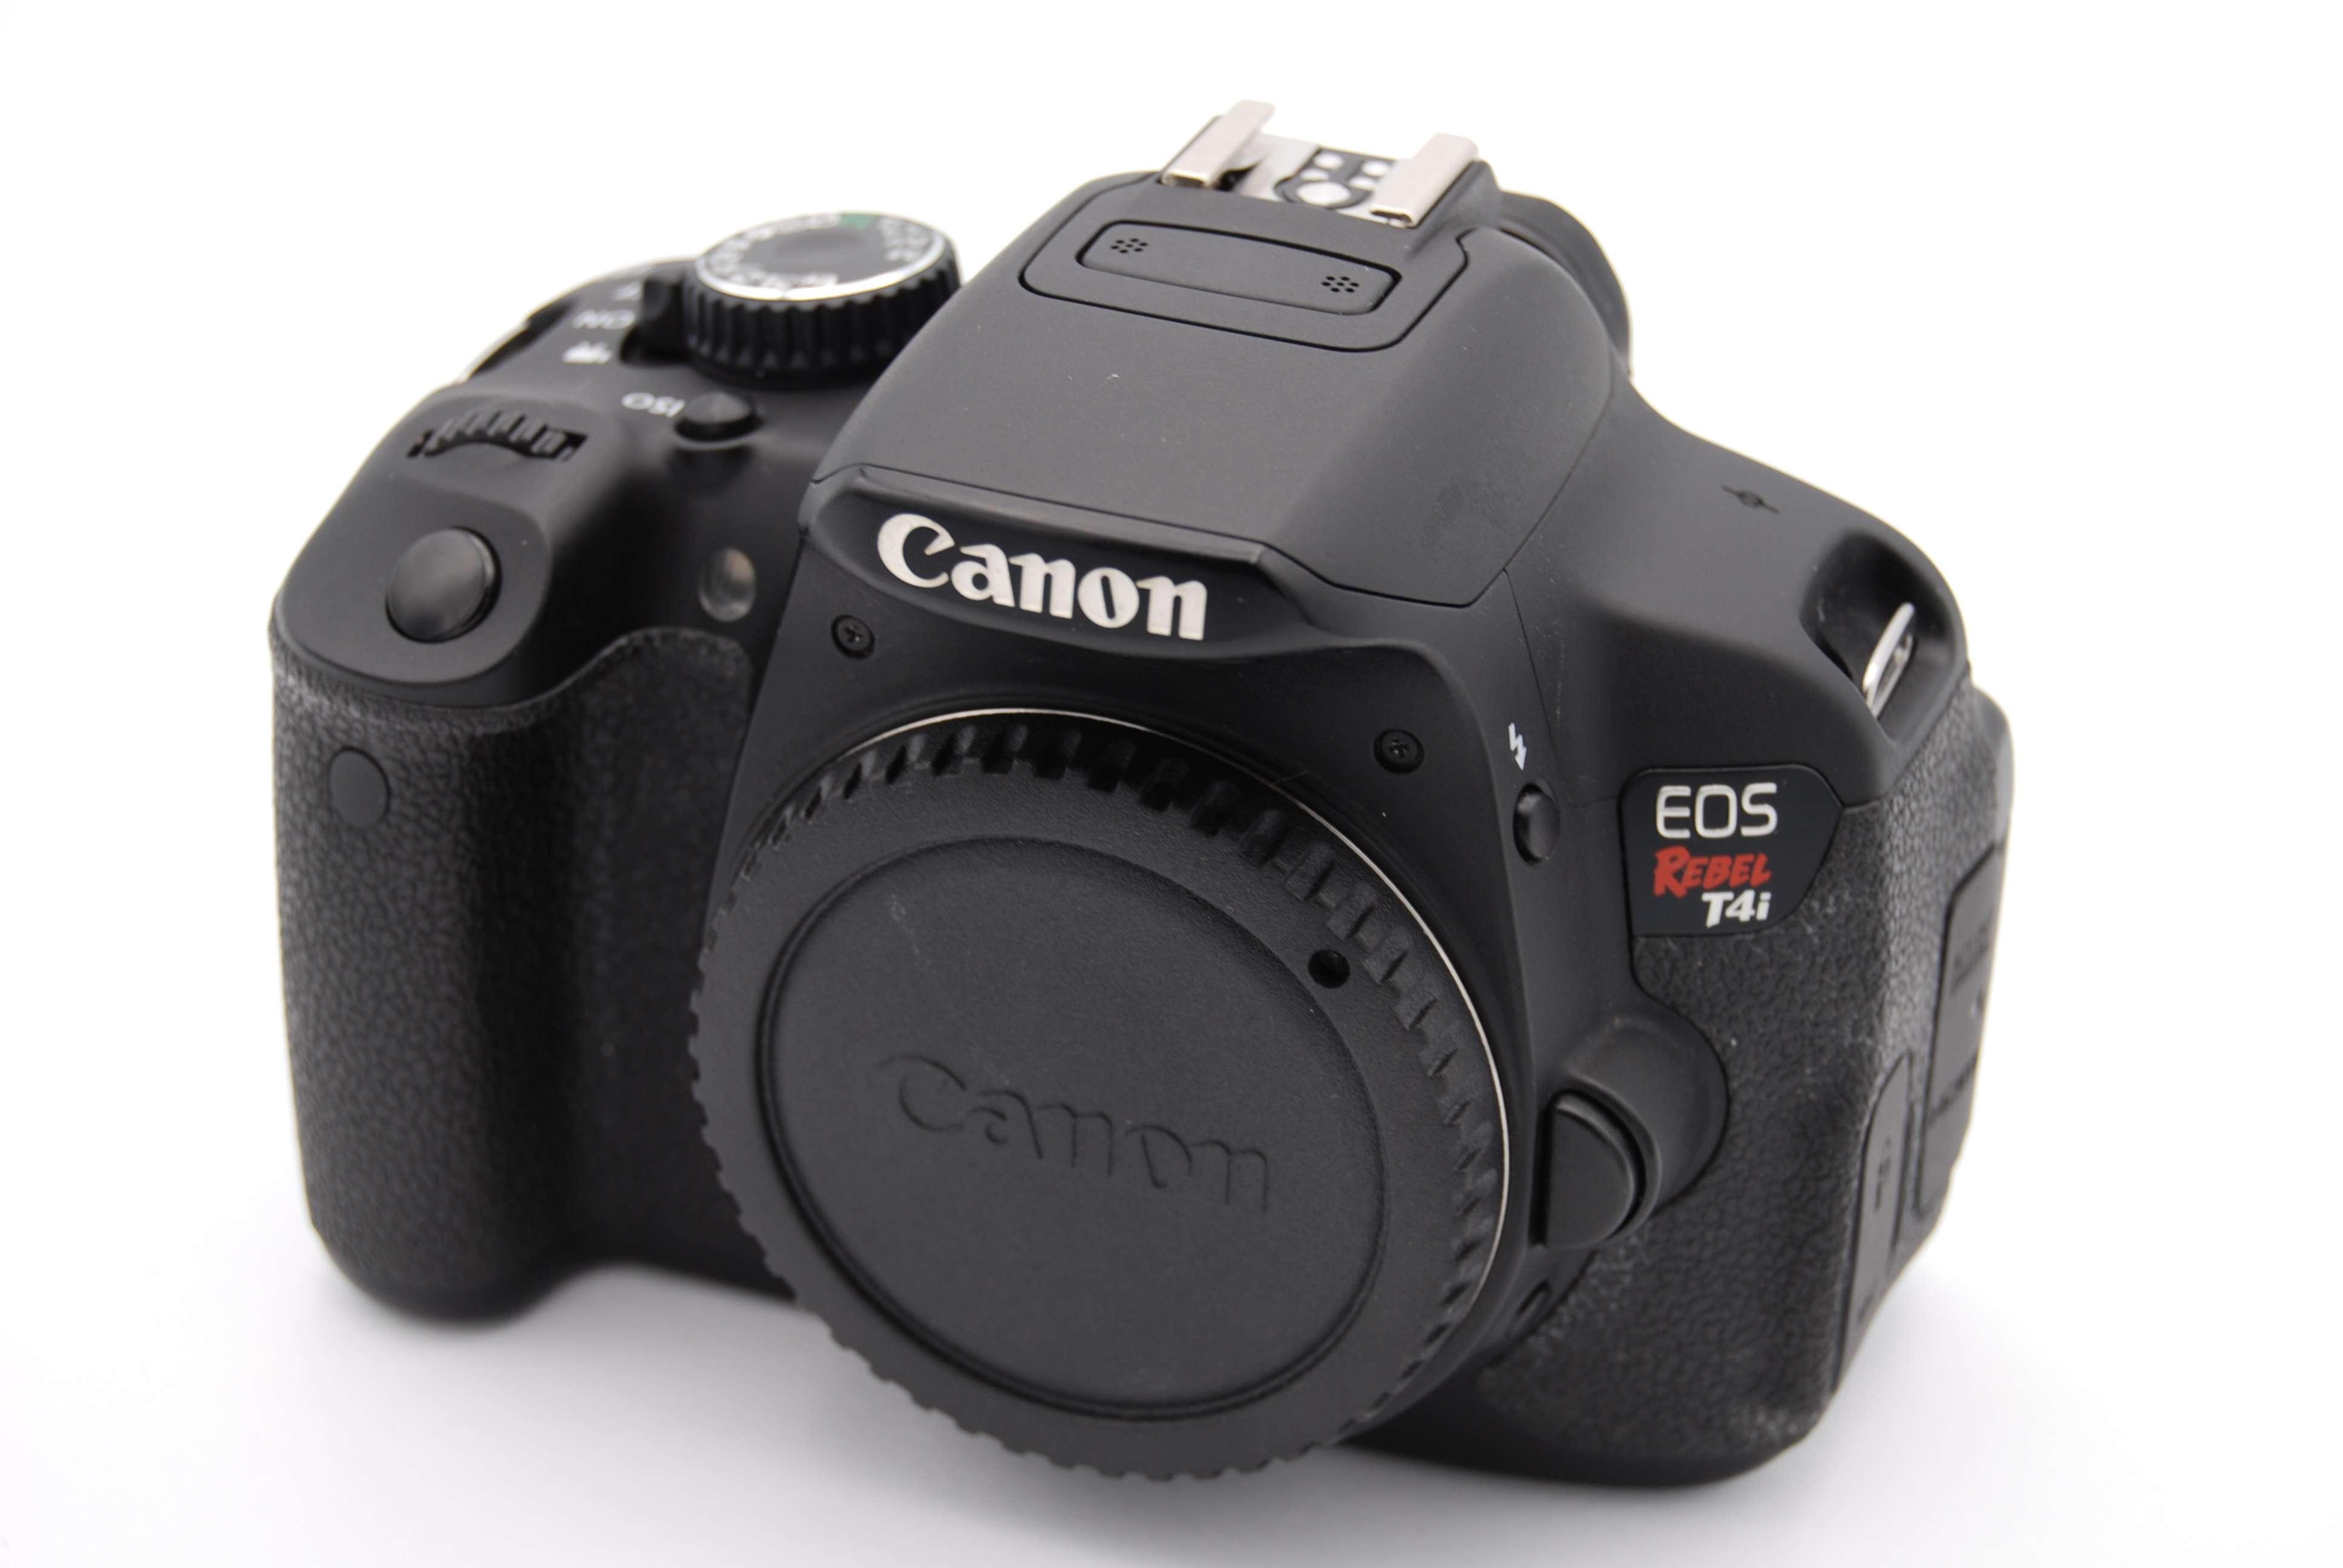 canon eos 650d rebel t4i kiss x6i 18mp 3 screen dslr camera rh ebay com Photography Canon EOS 5D Canon EOS Rebel T3i